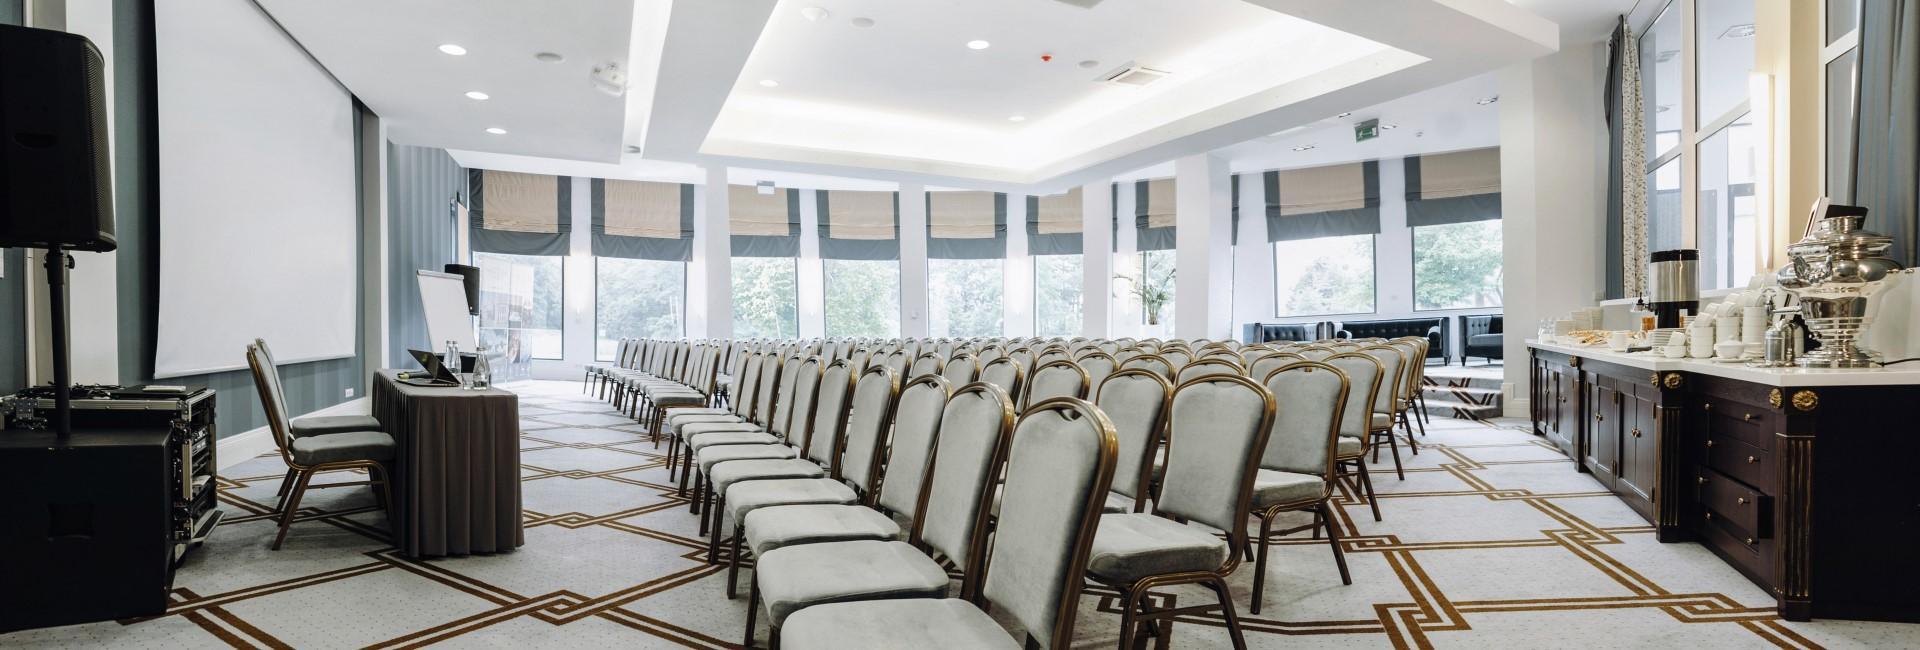 Seminar at Hotel Romantyczny Palace in Turznie, Kuyavia Pomeranian